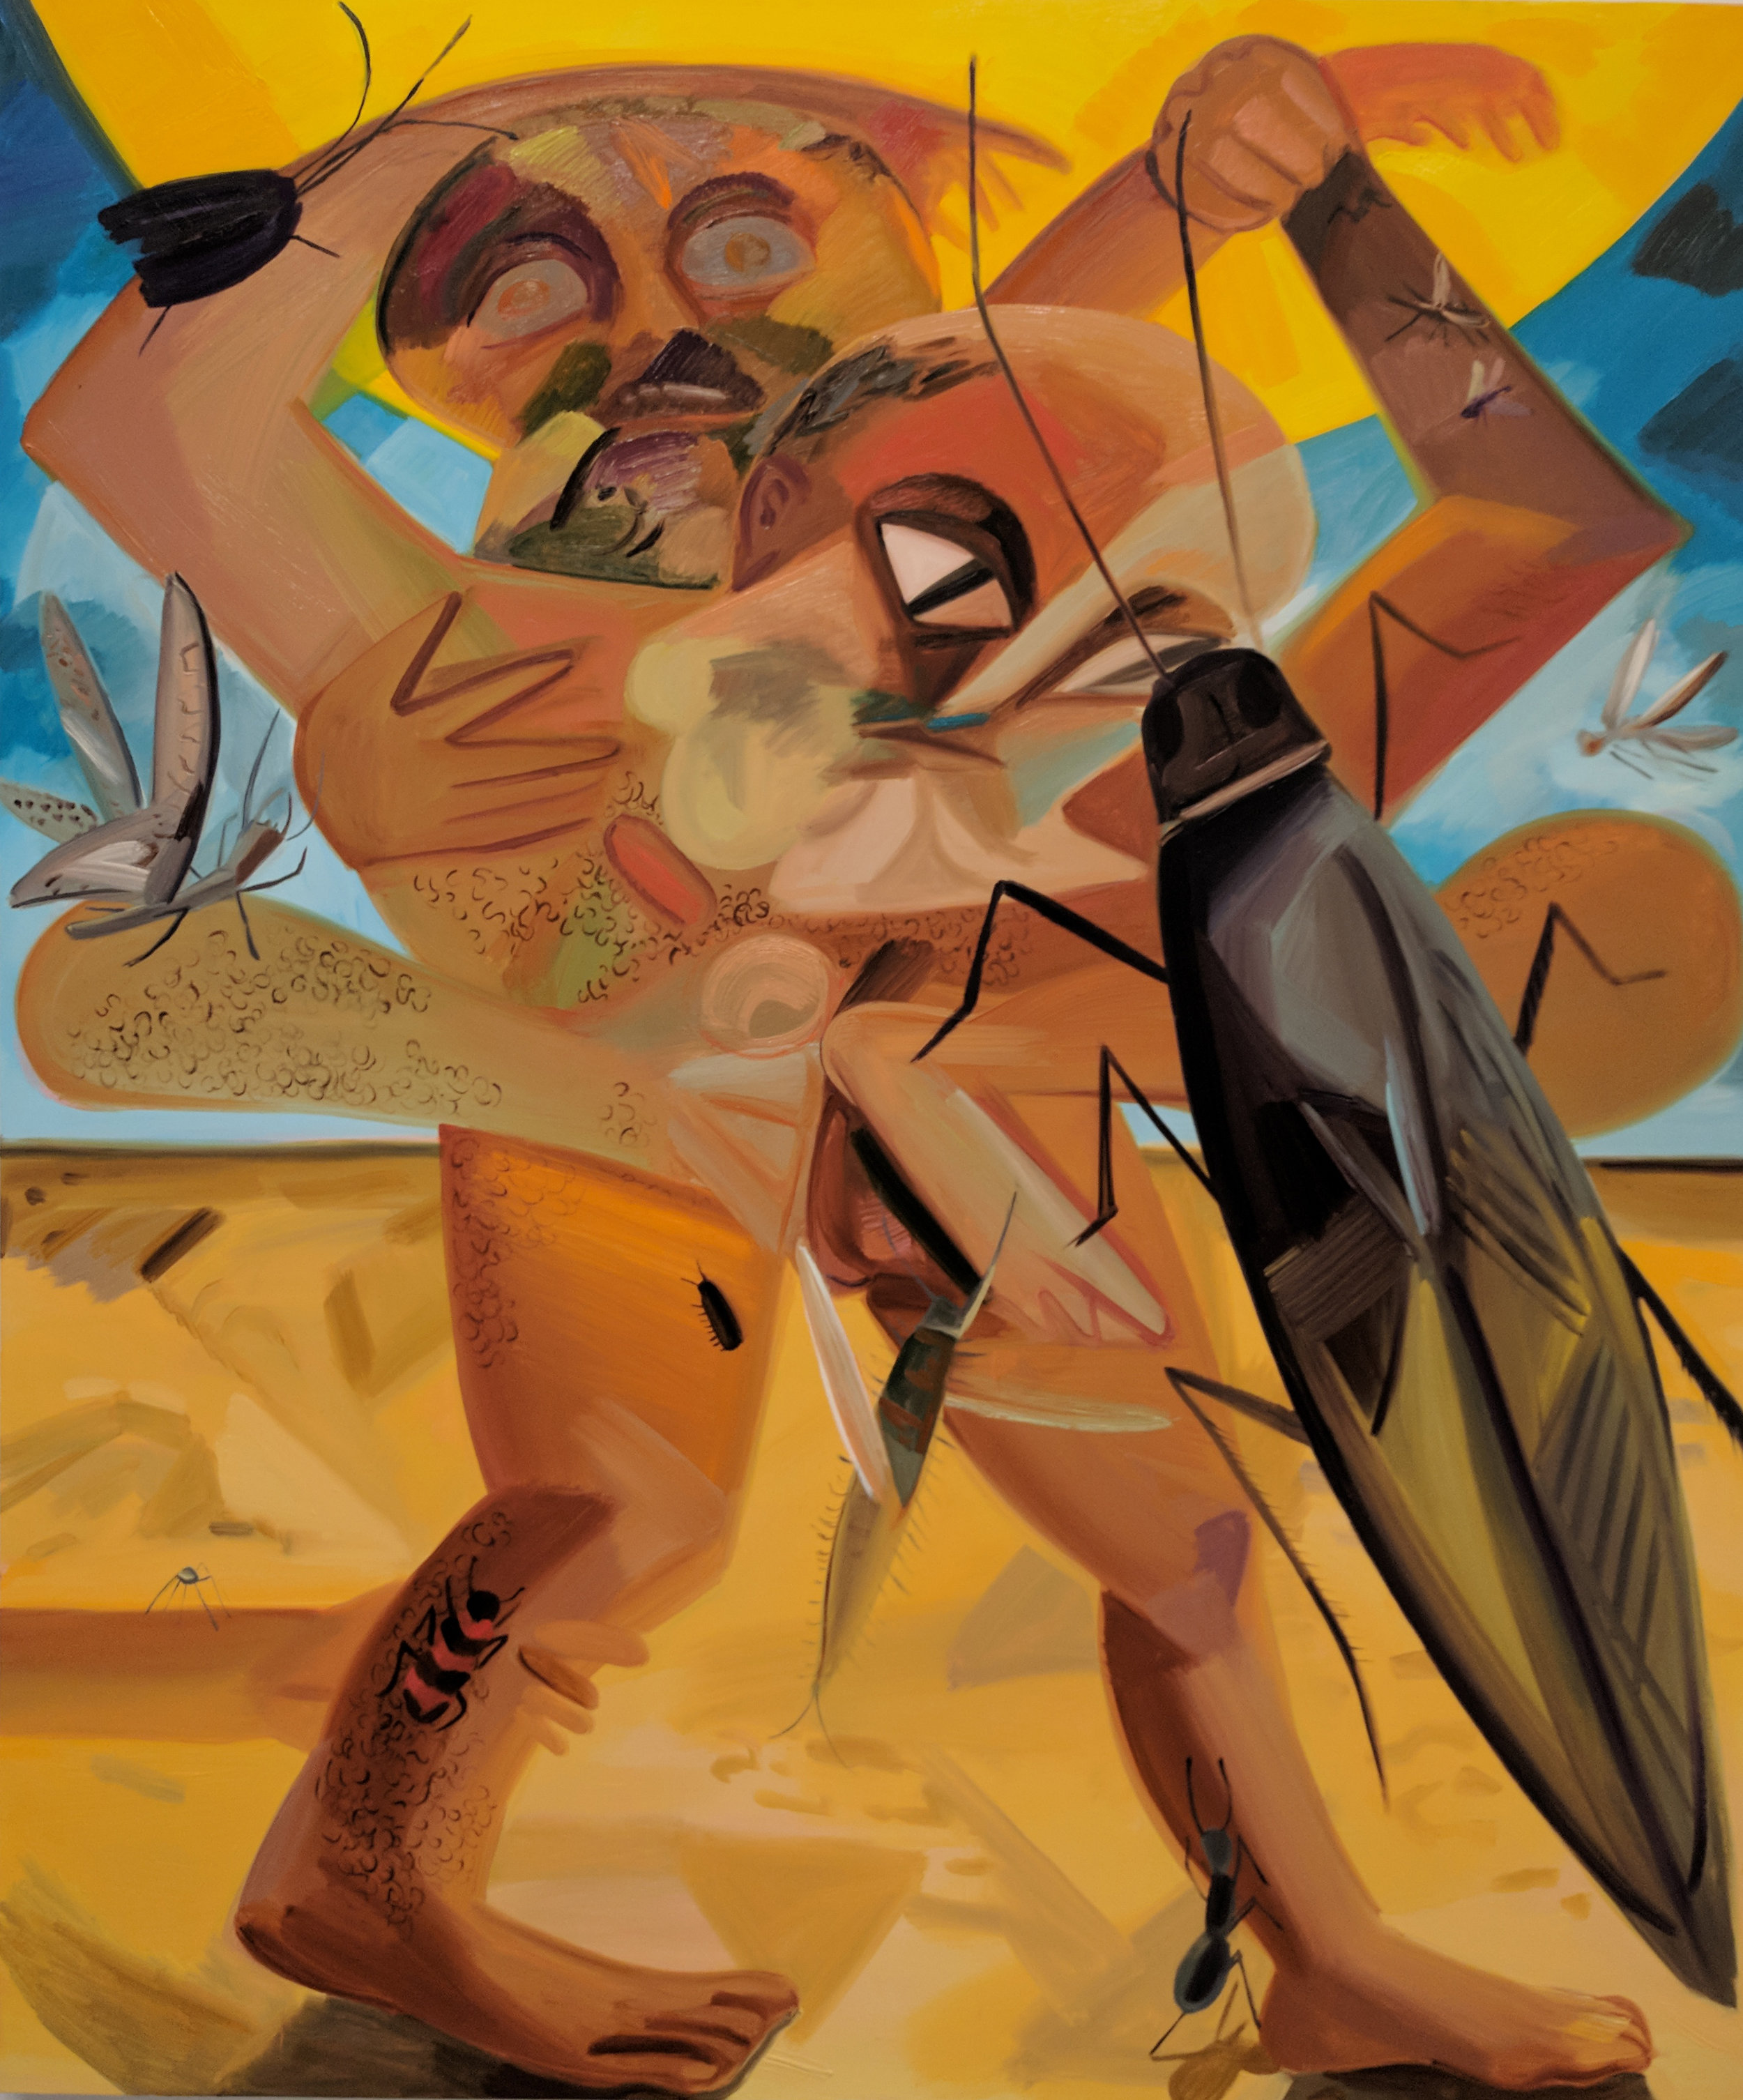 Bugs  by Dana Scutz